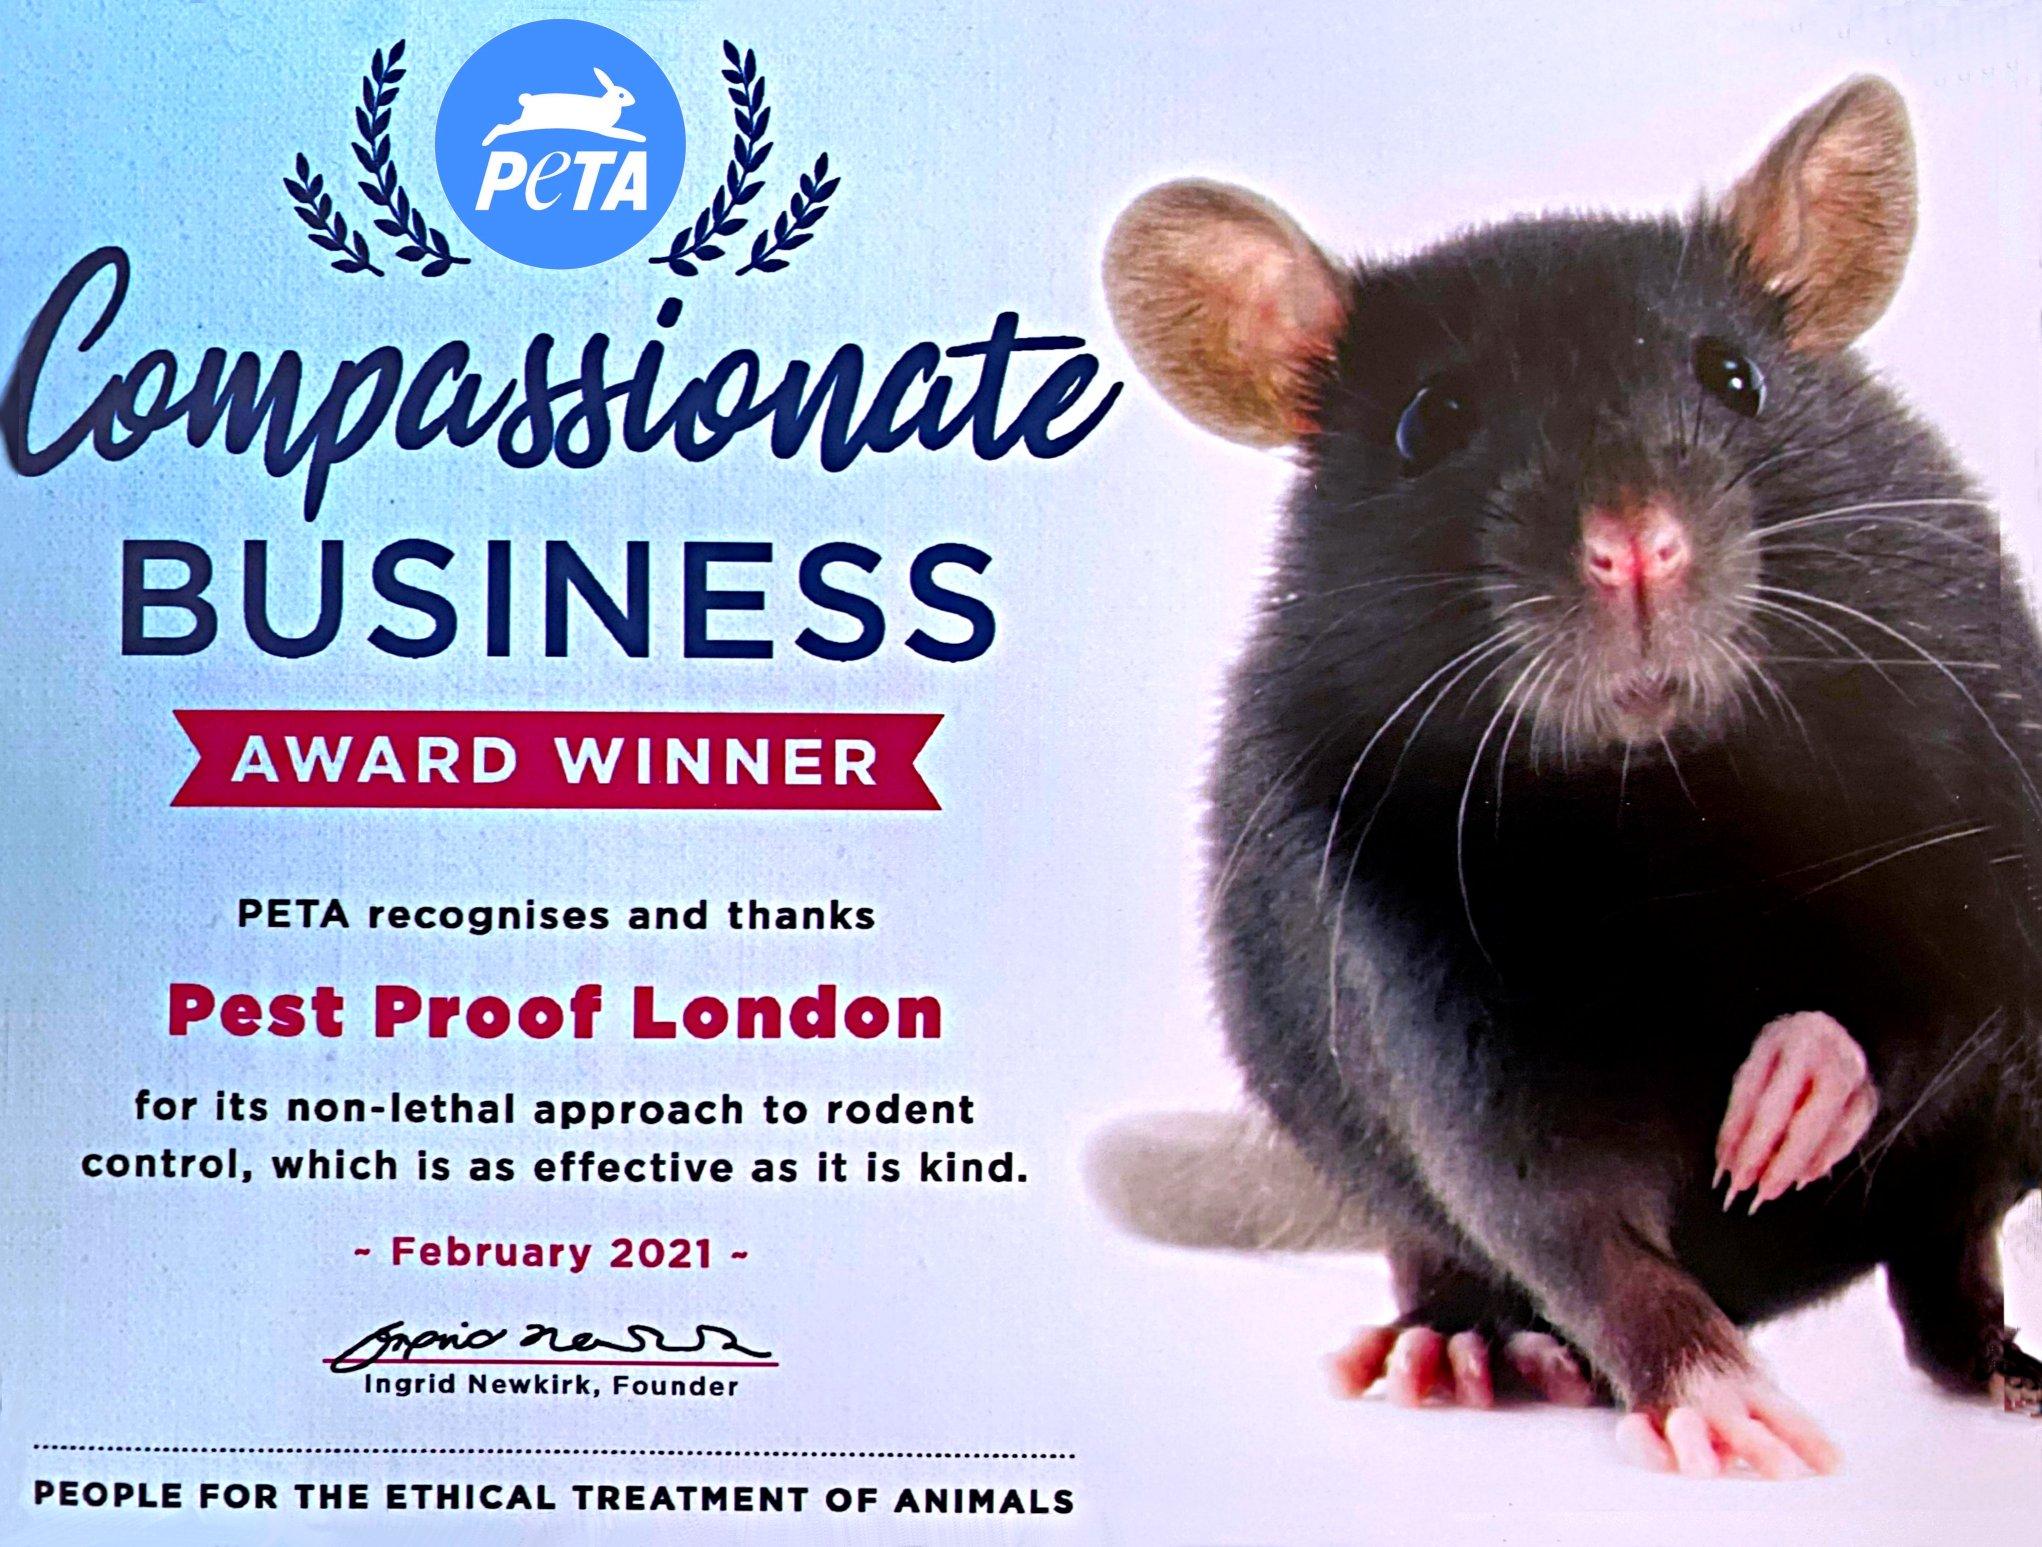 PETA Approved Pest Control